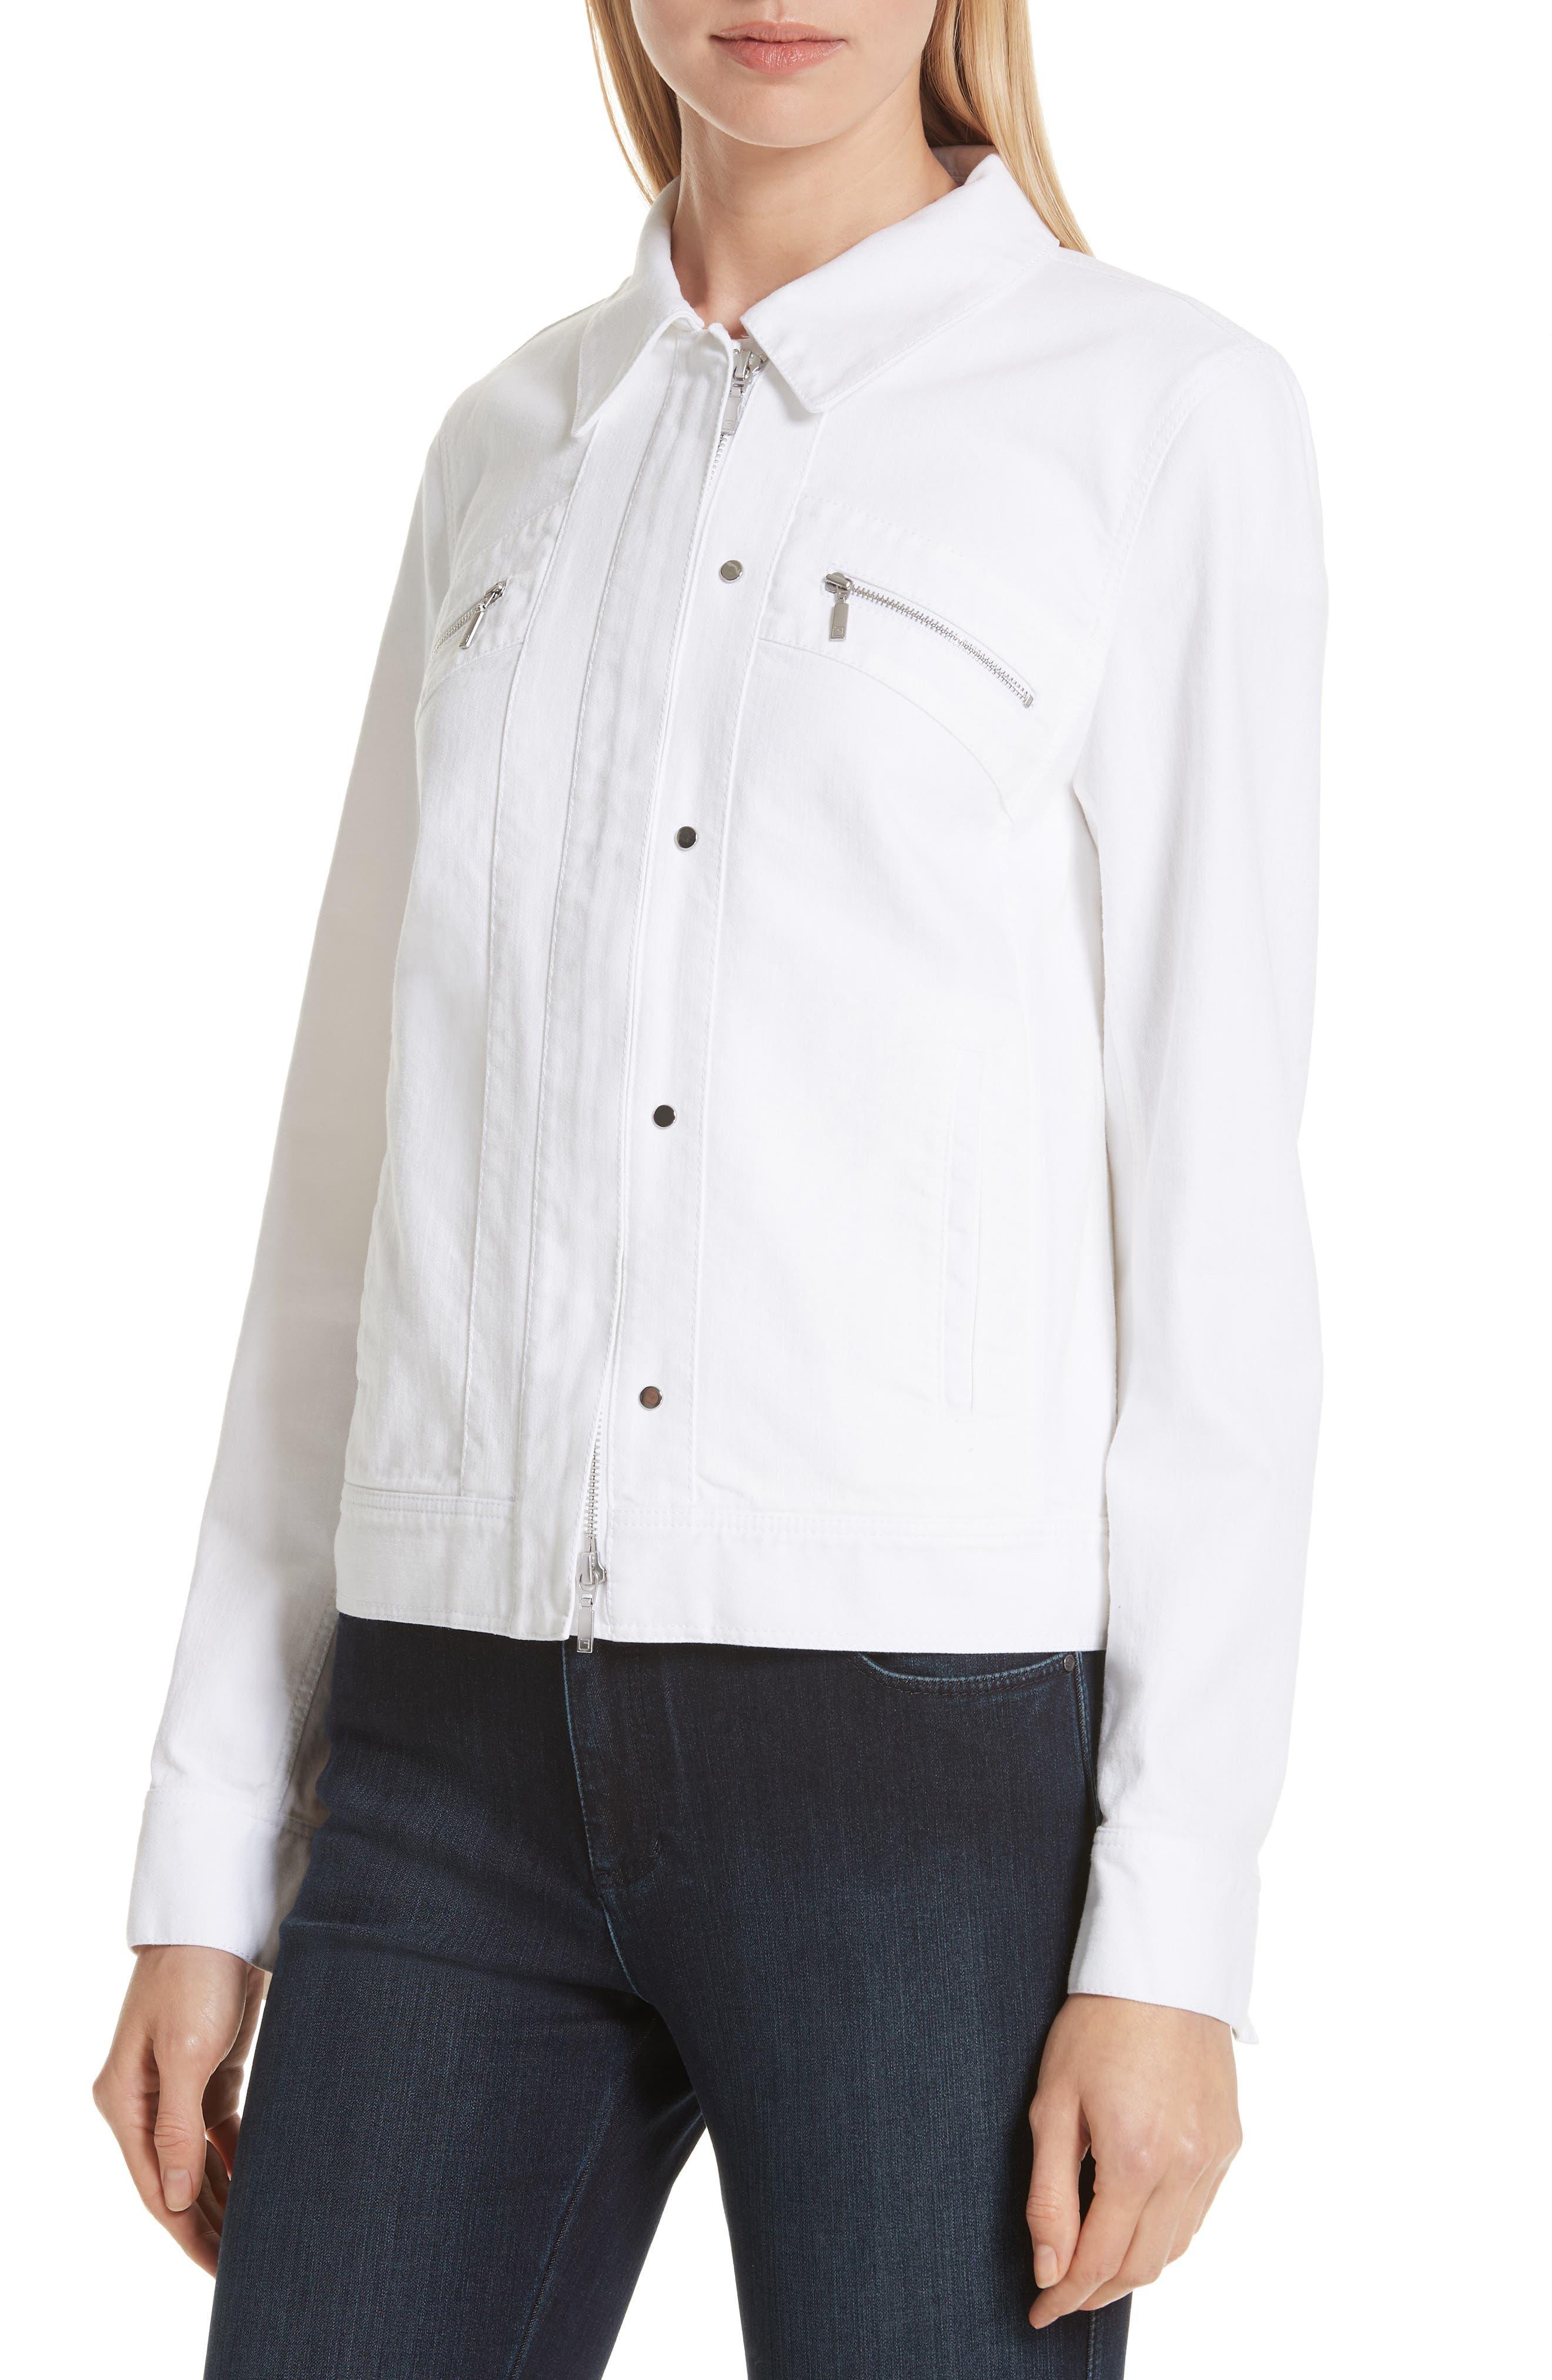 Kesha Denim Jacket,                             Alternate thumbnail 4, color,                             WHITE